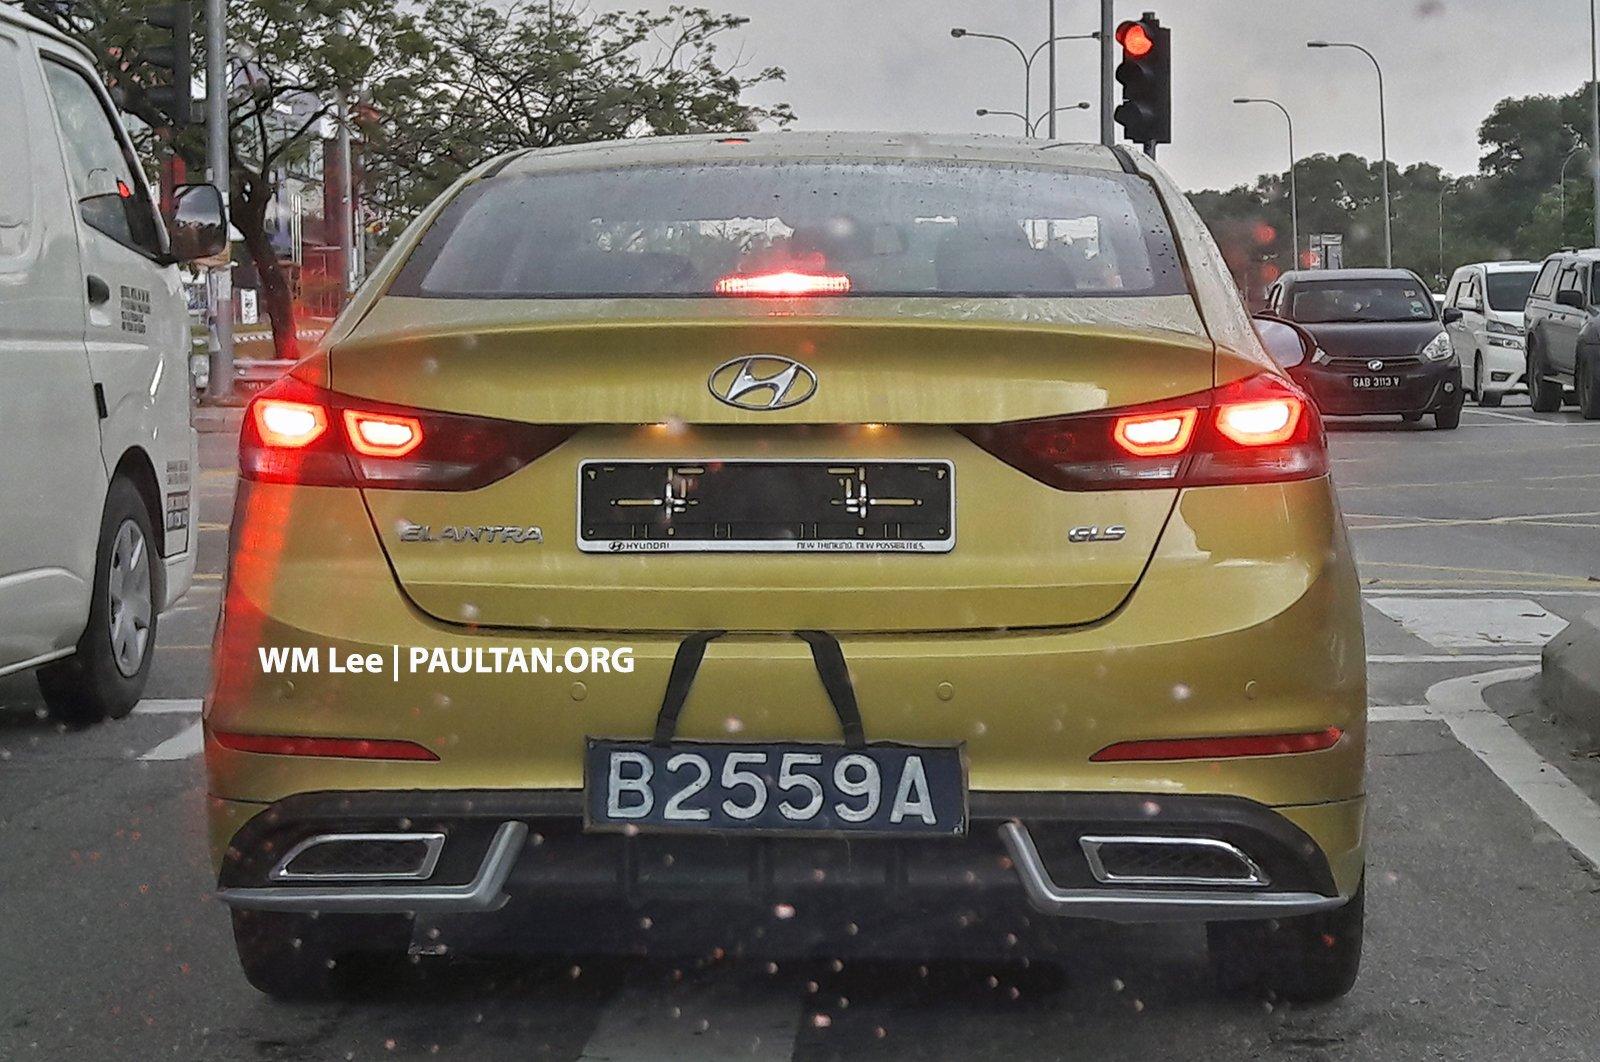 New Hyundai Elantra spotted – non-turbo with bodykit Image 654721